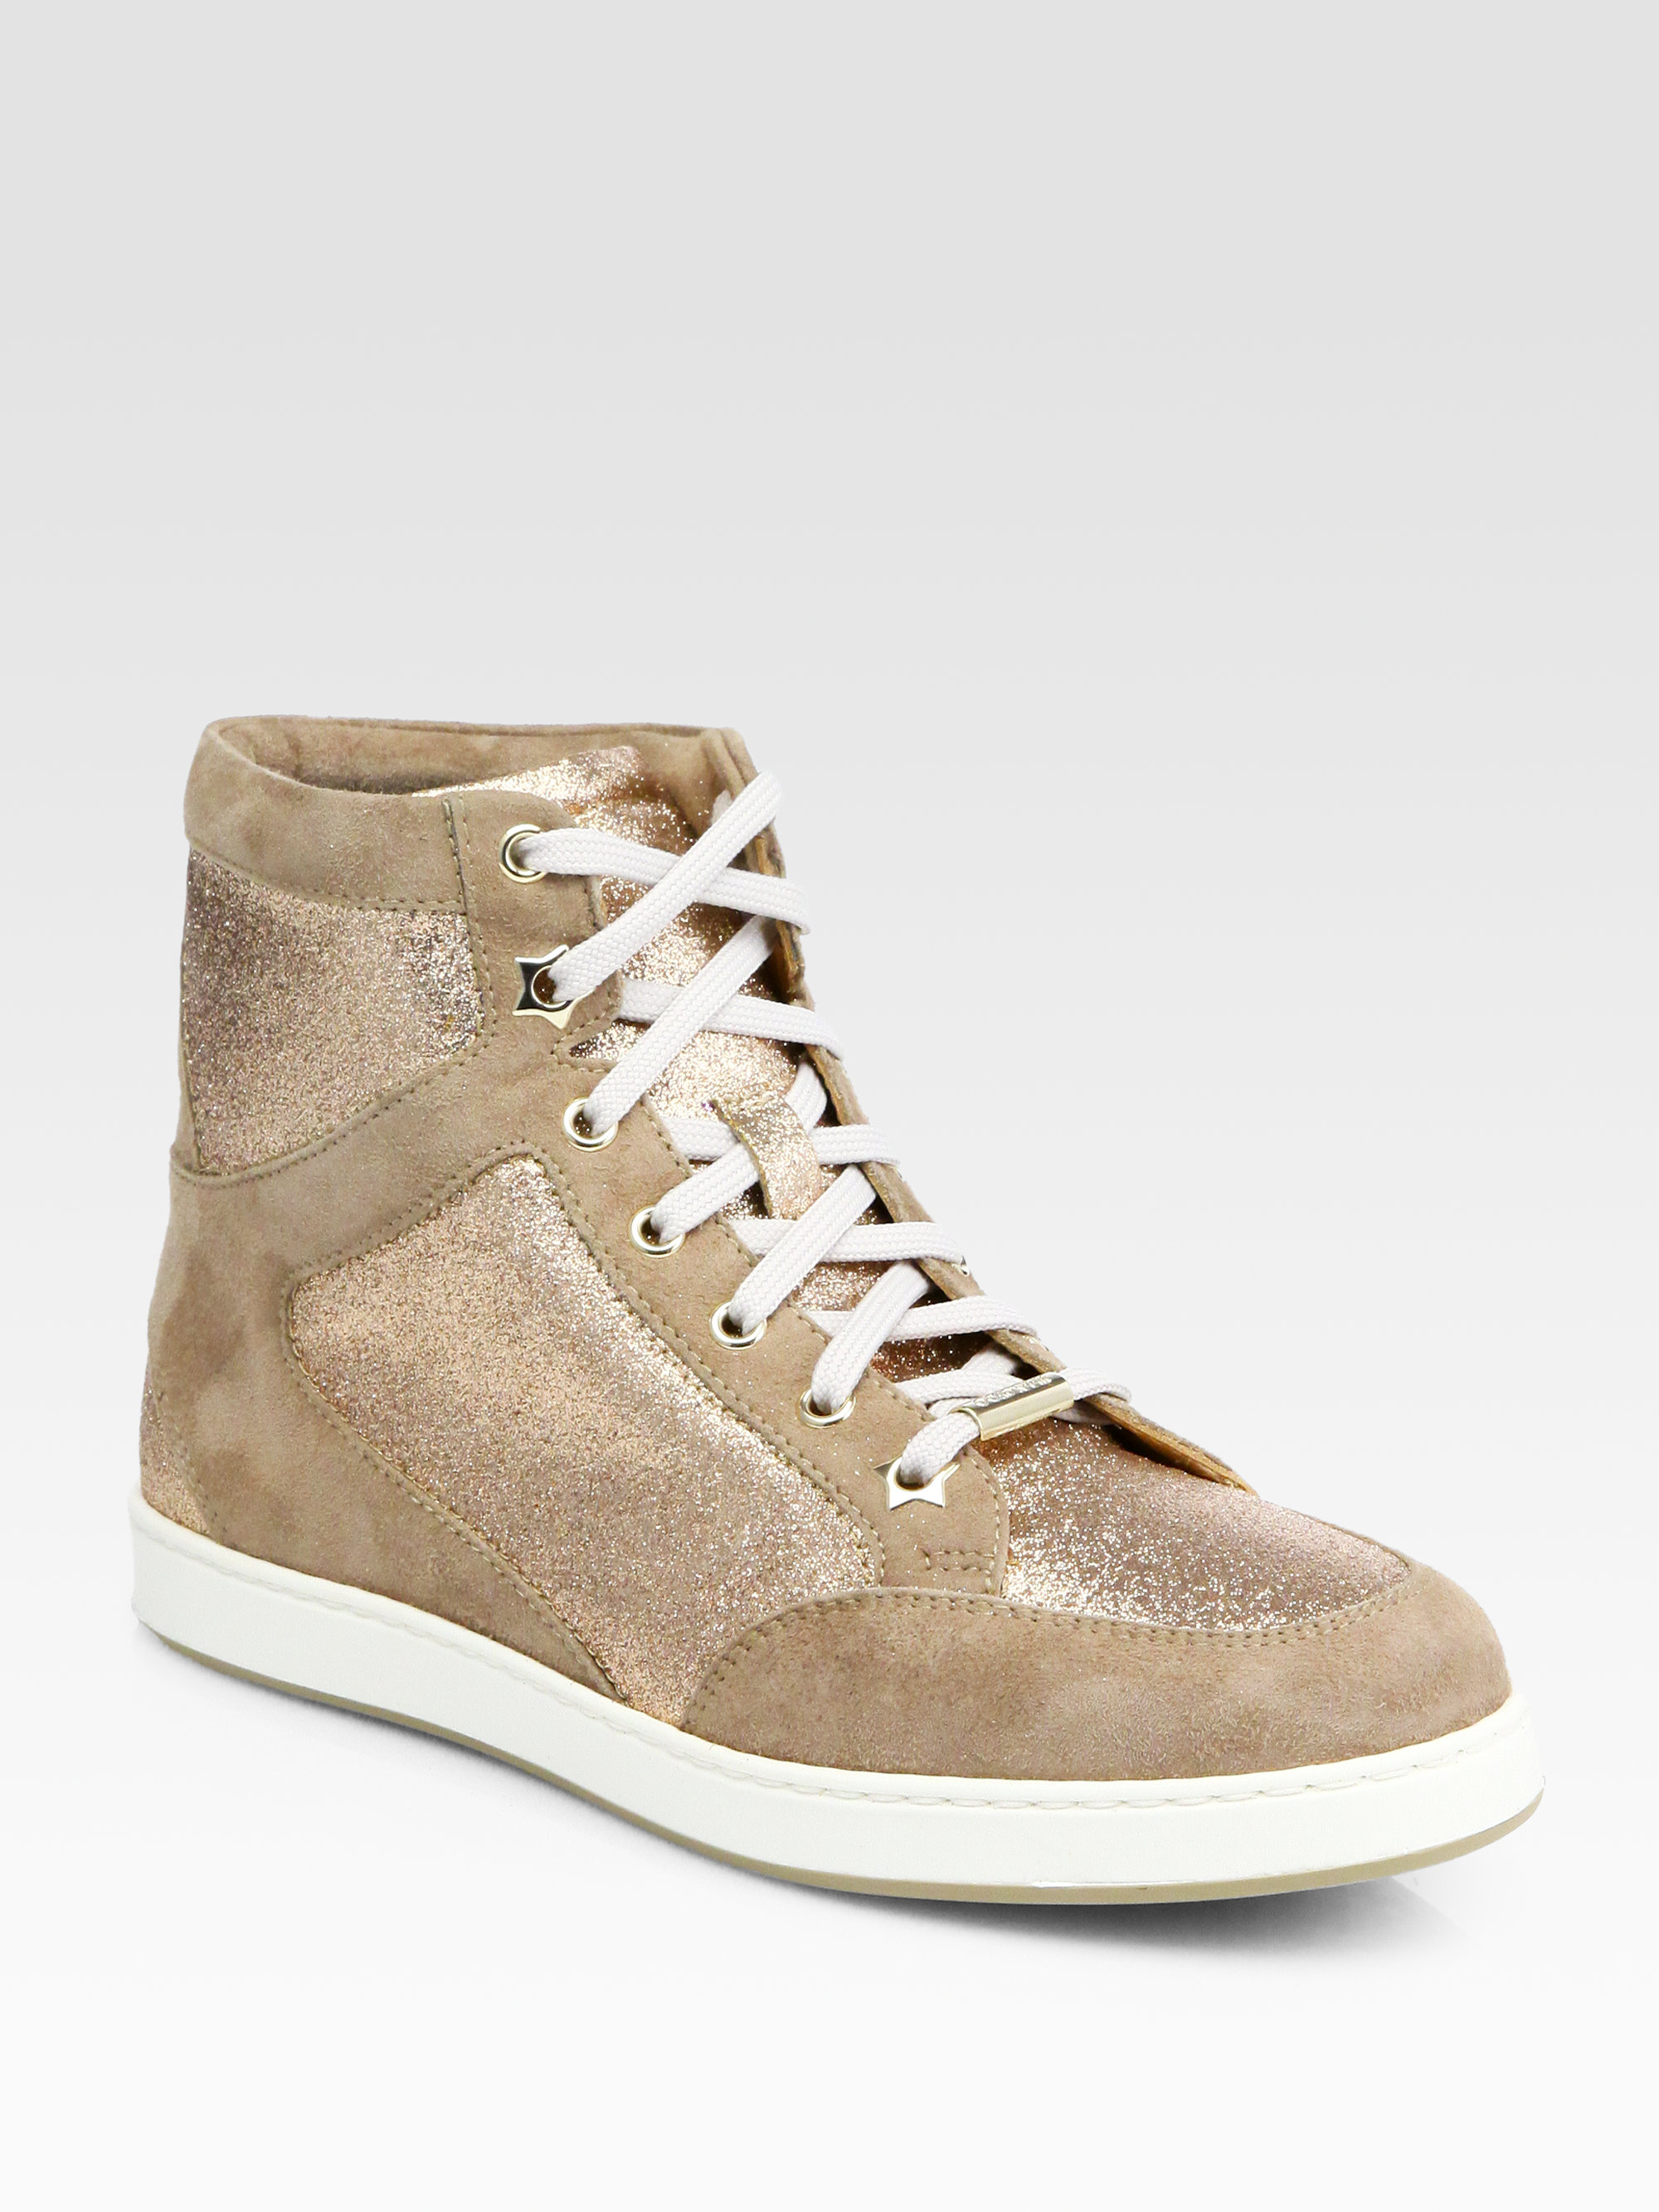 bd467975a8f9f2 ... black leather low top trainers fbc1e 86625; australia lyst jimmy choo  tokyo glitter suede hightop sneakers in natural d0cbf f6b77